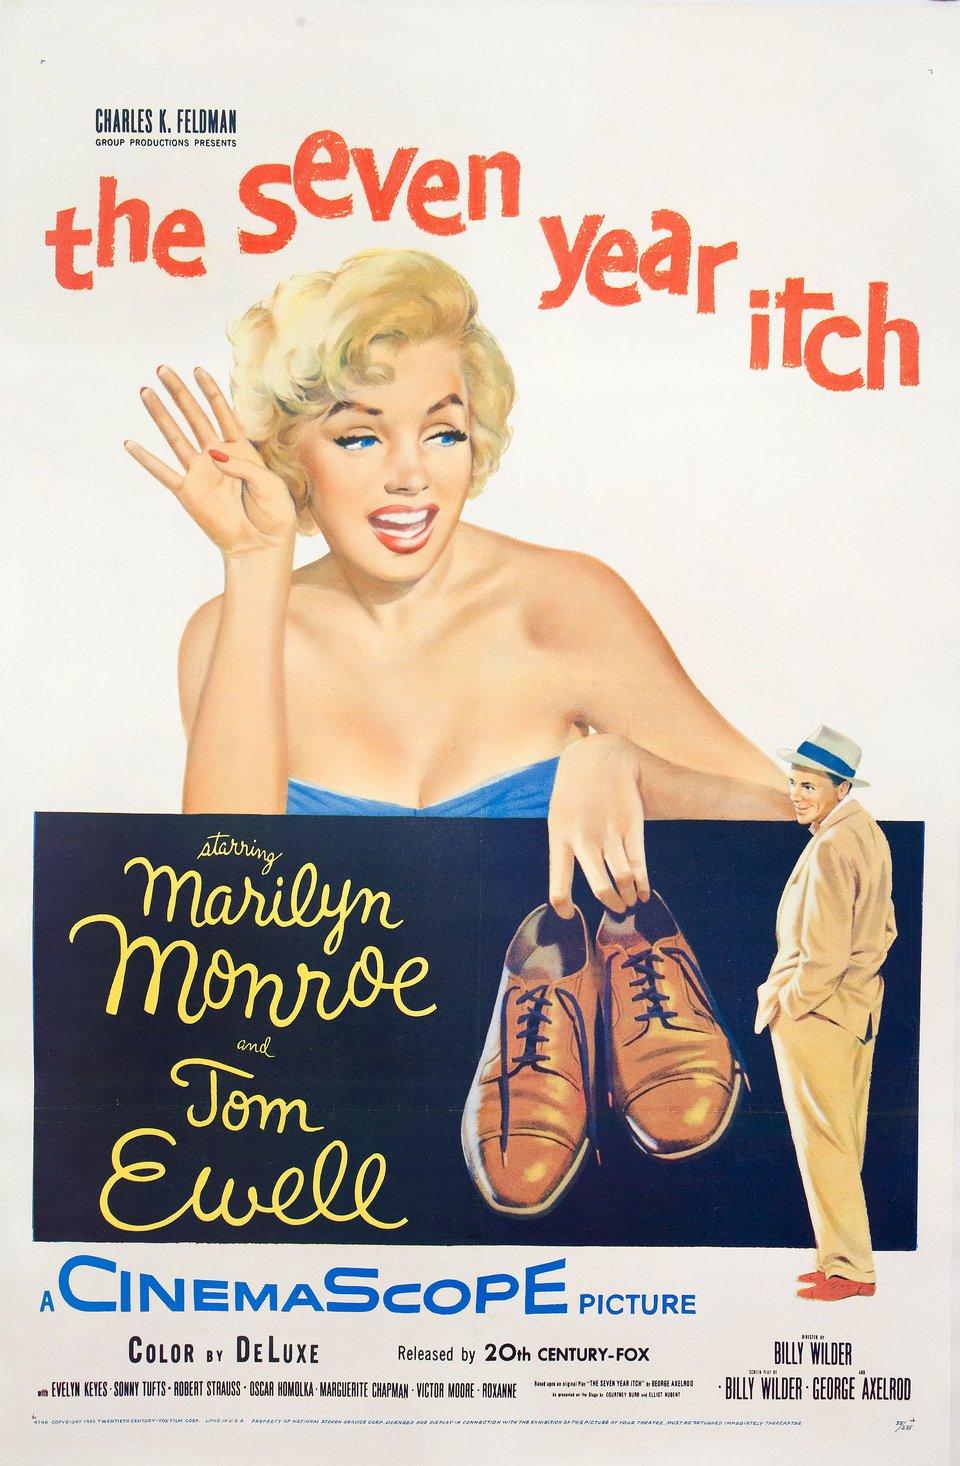 1955 U.S. One Sheet Poster